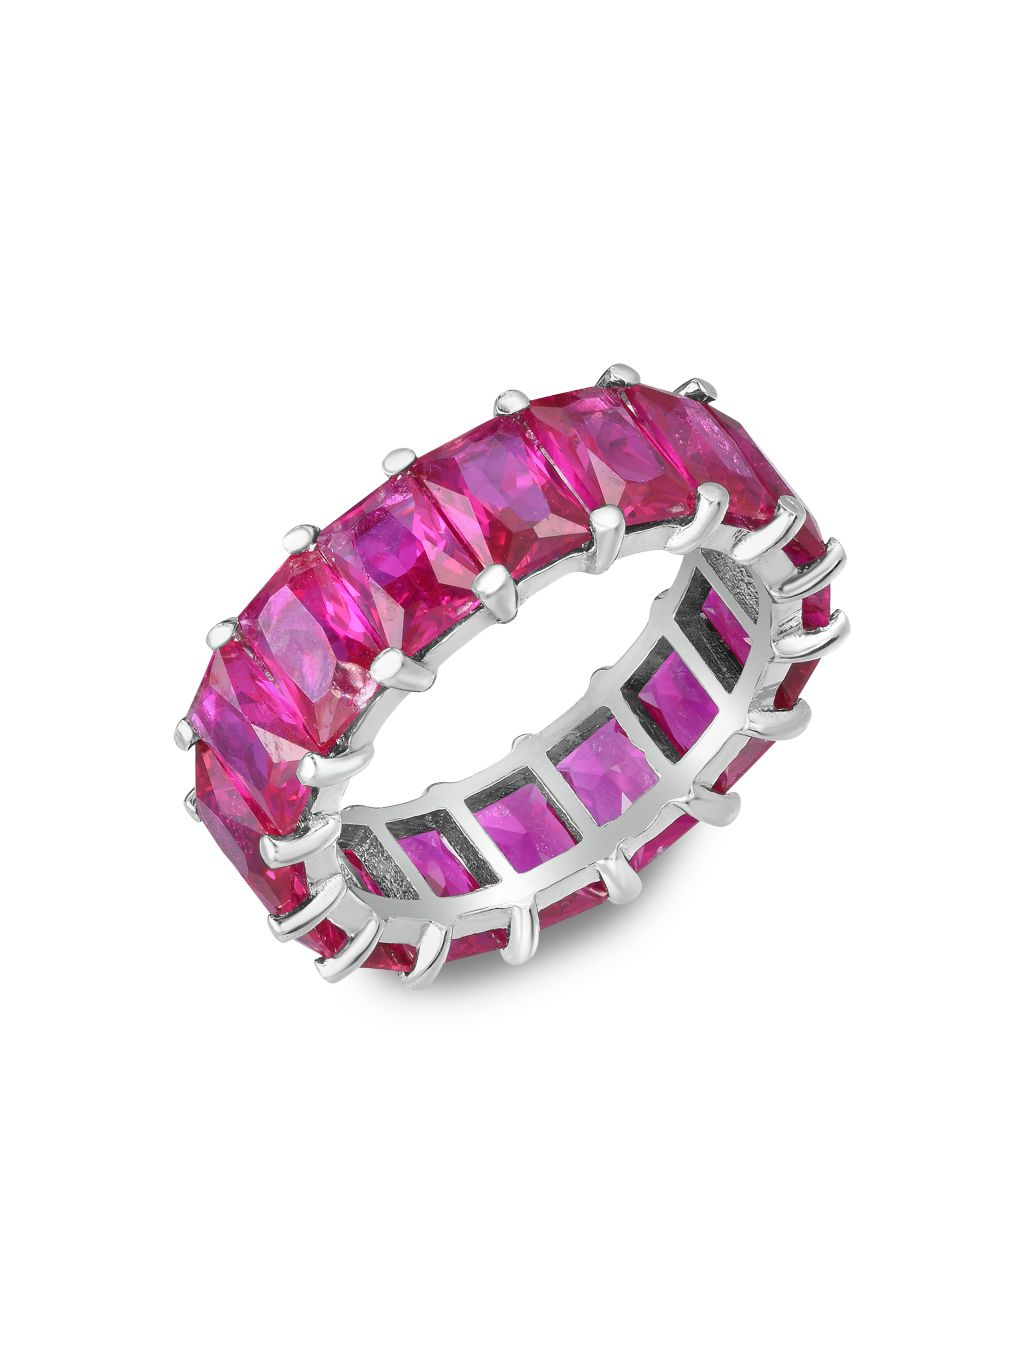 Chloe & Madison Crystal Eternity Ring